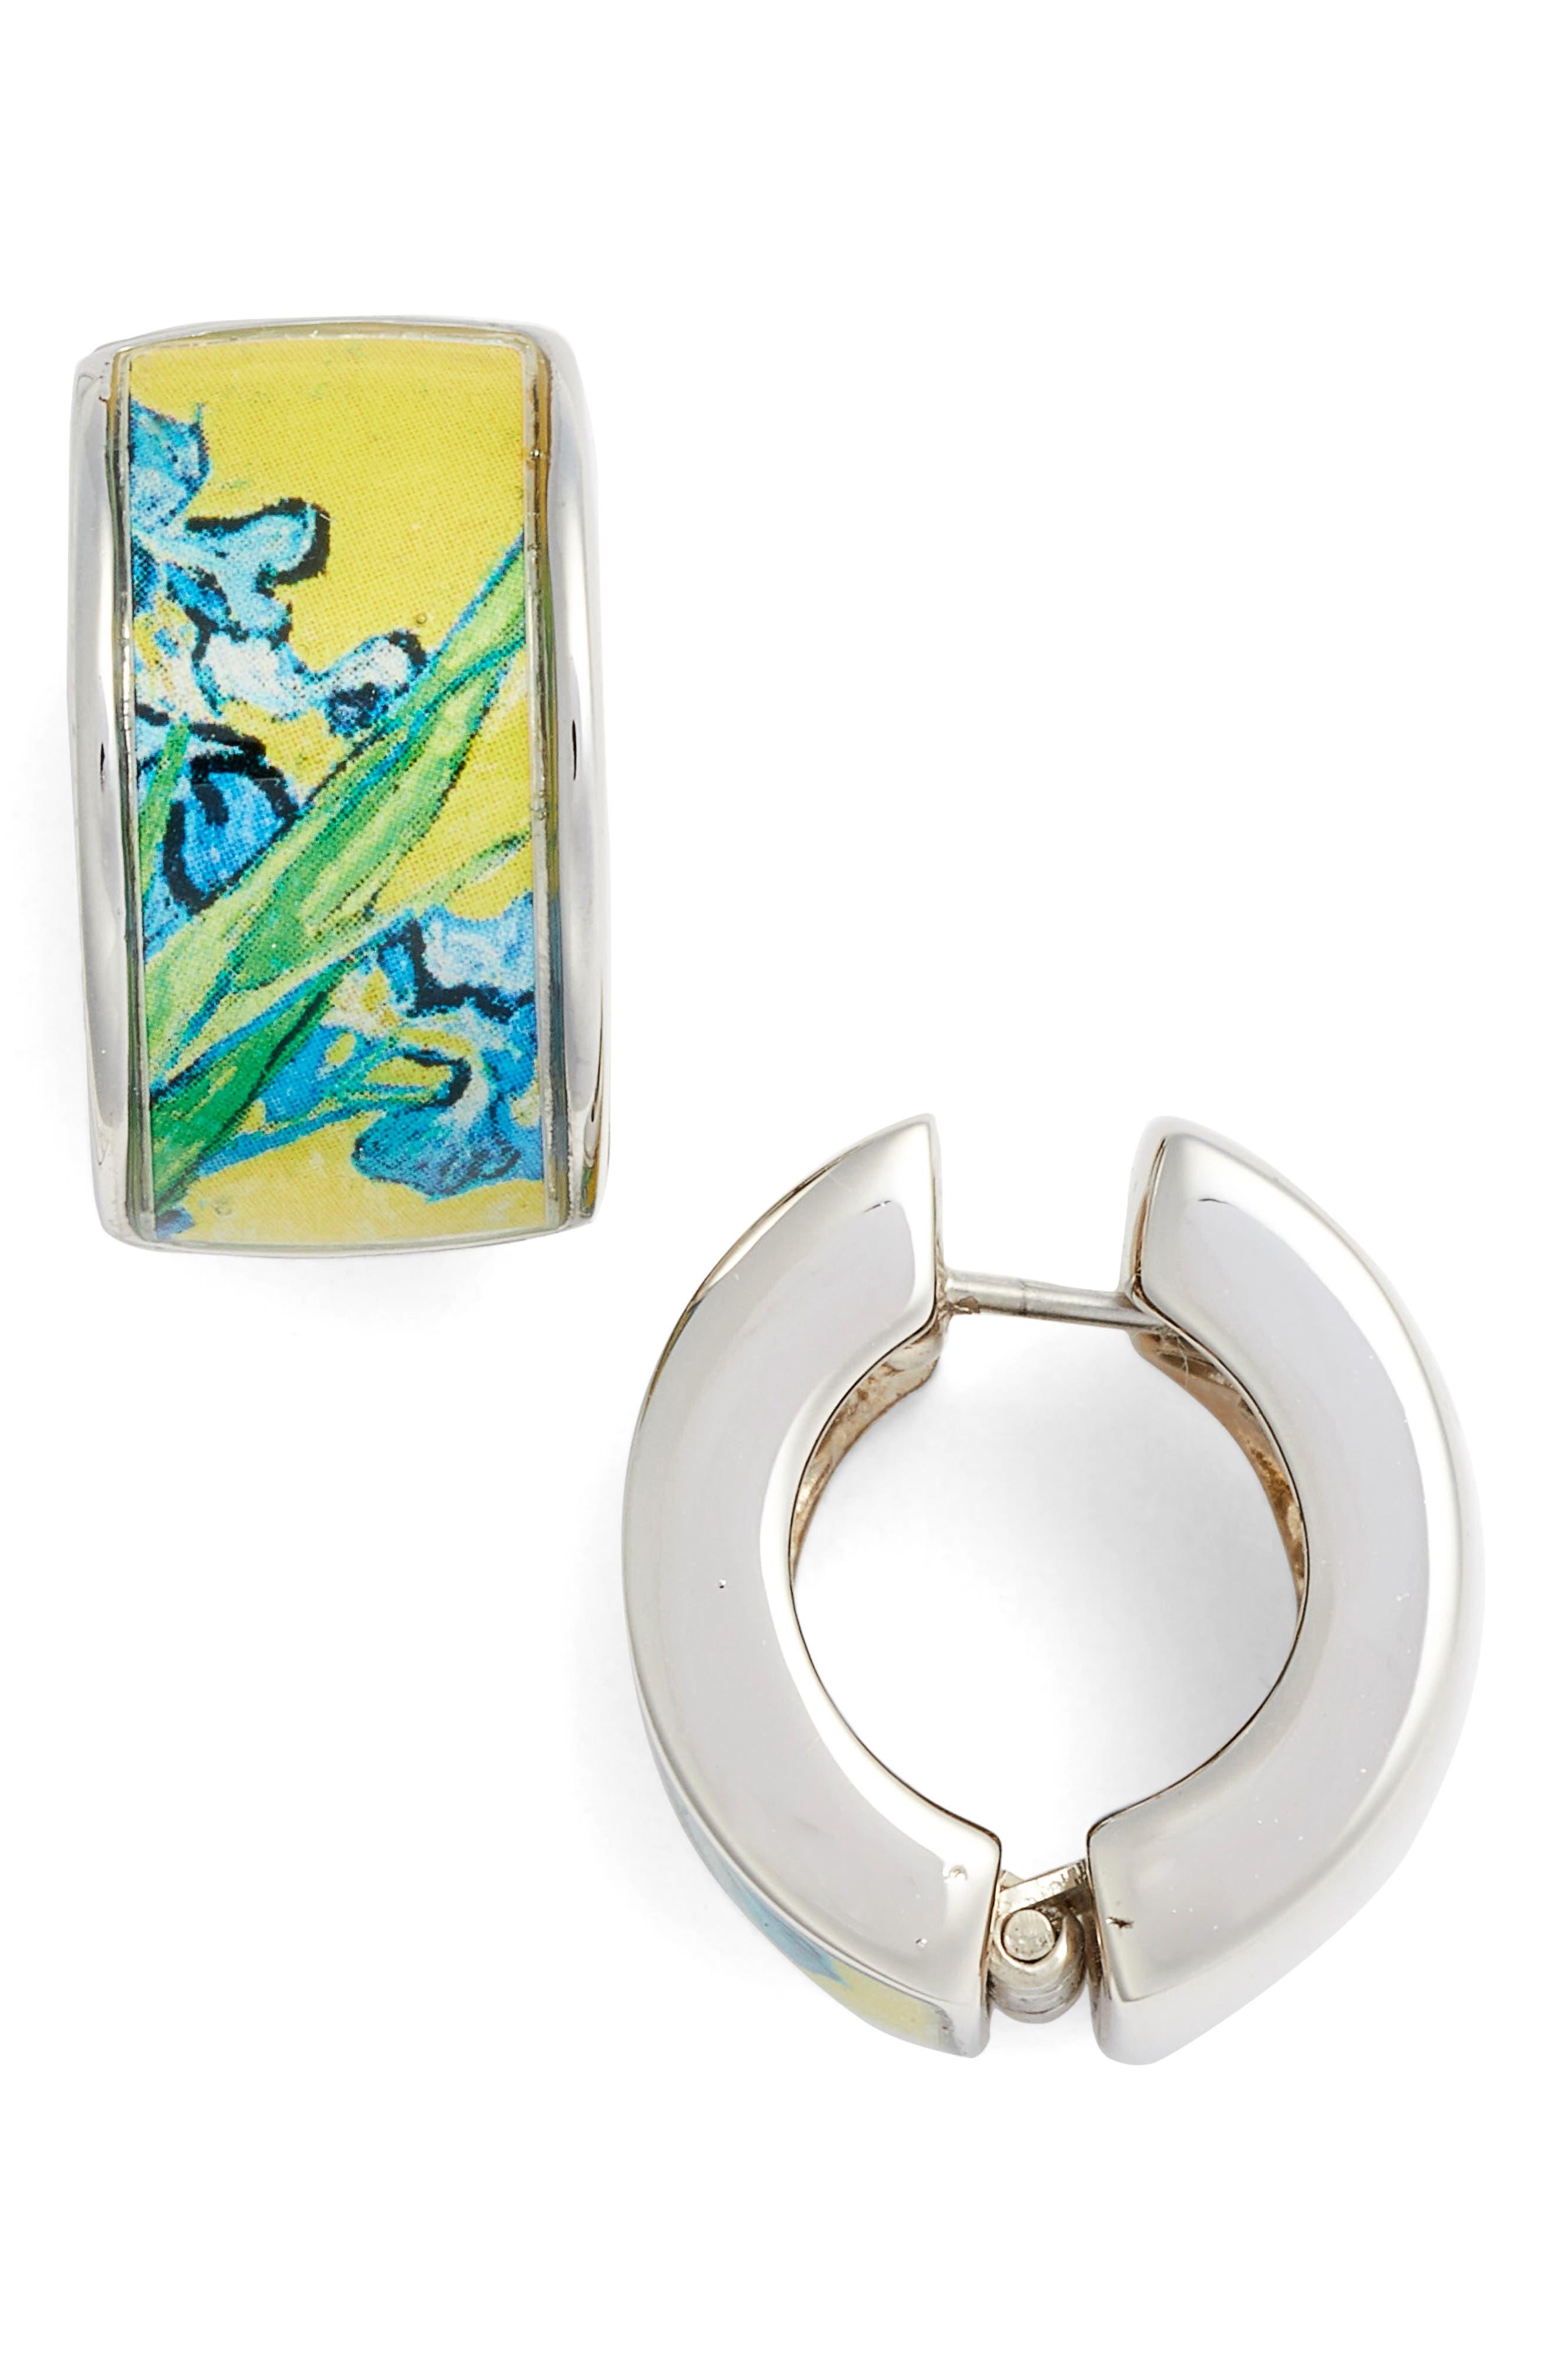 Silvertone Irises Earrings,                         Main,                         color, BLUE/ SILVER